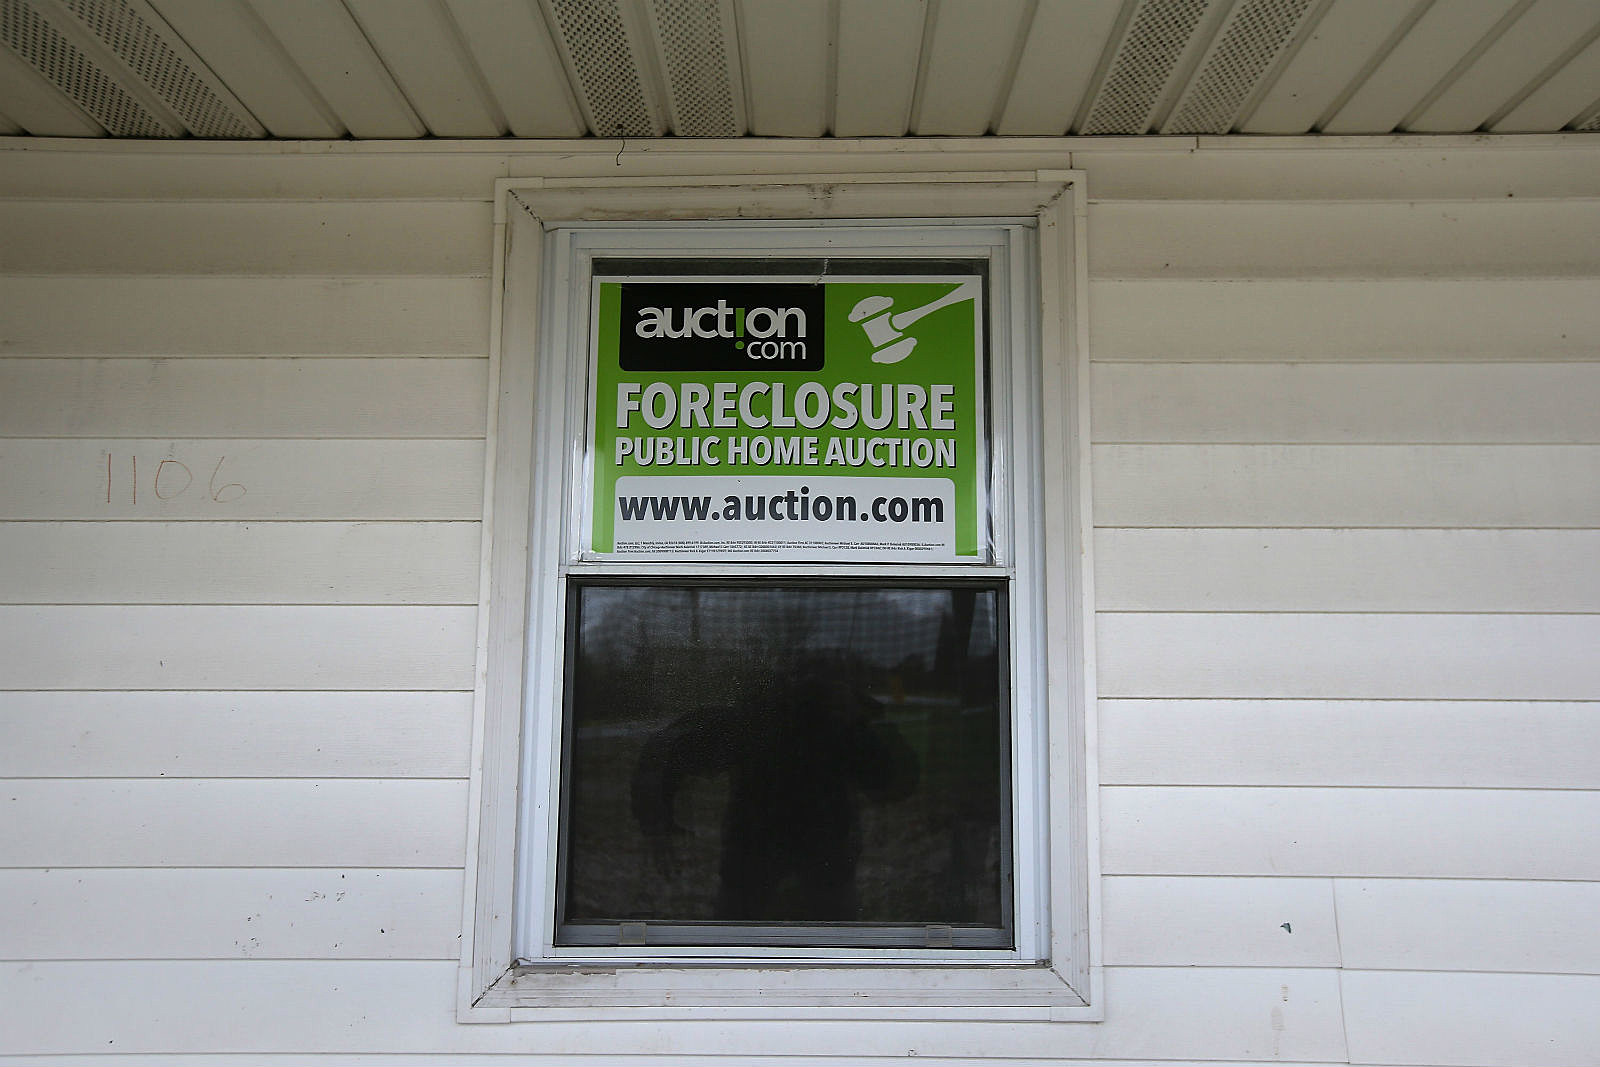 Foreclosure_John Moore/Getty